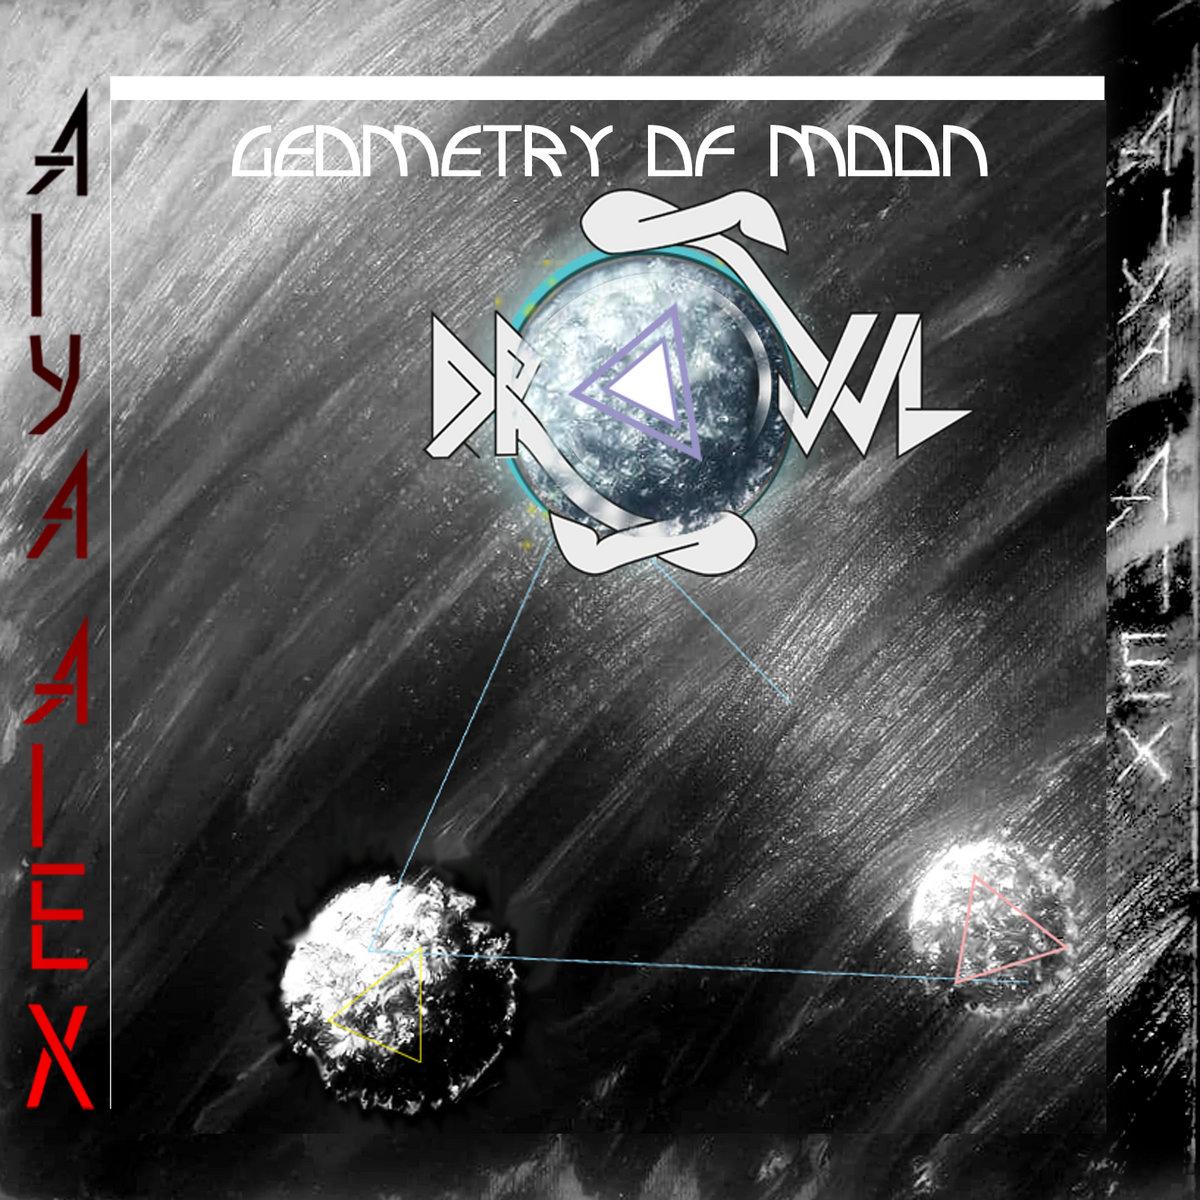 AlzAlya DrOwL – Geometry of Moon